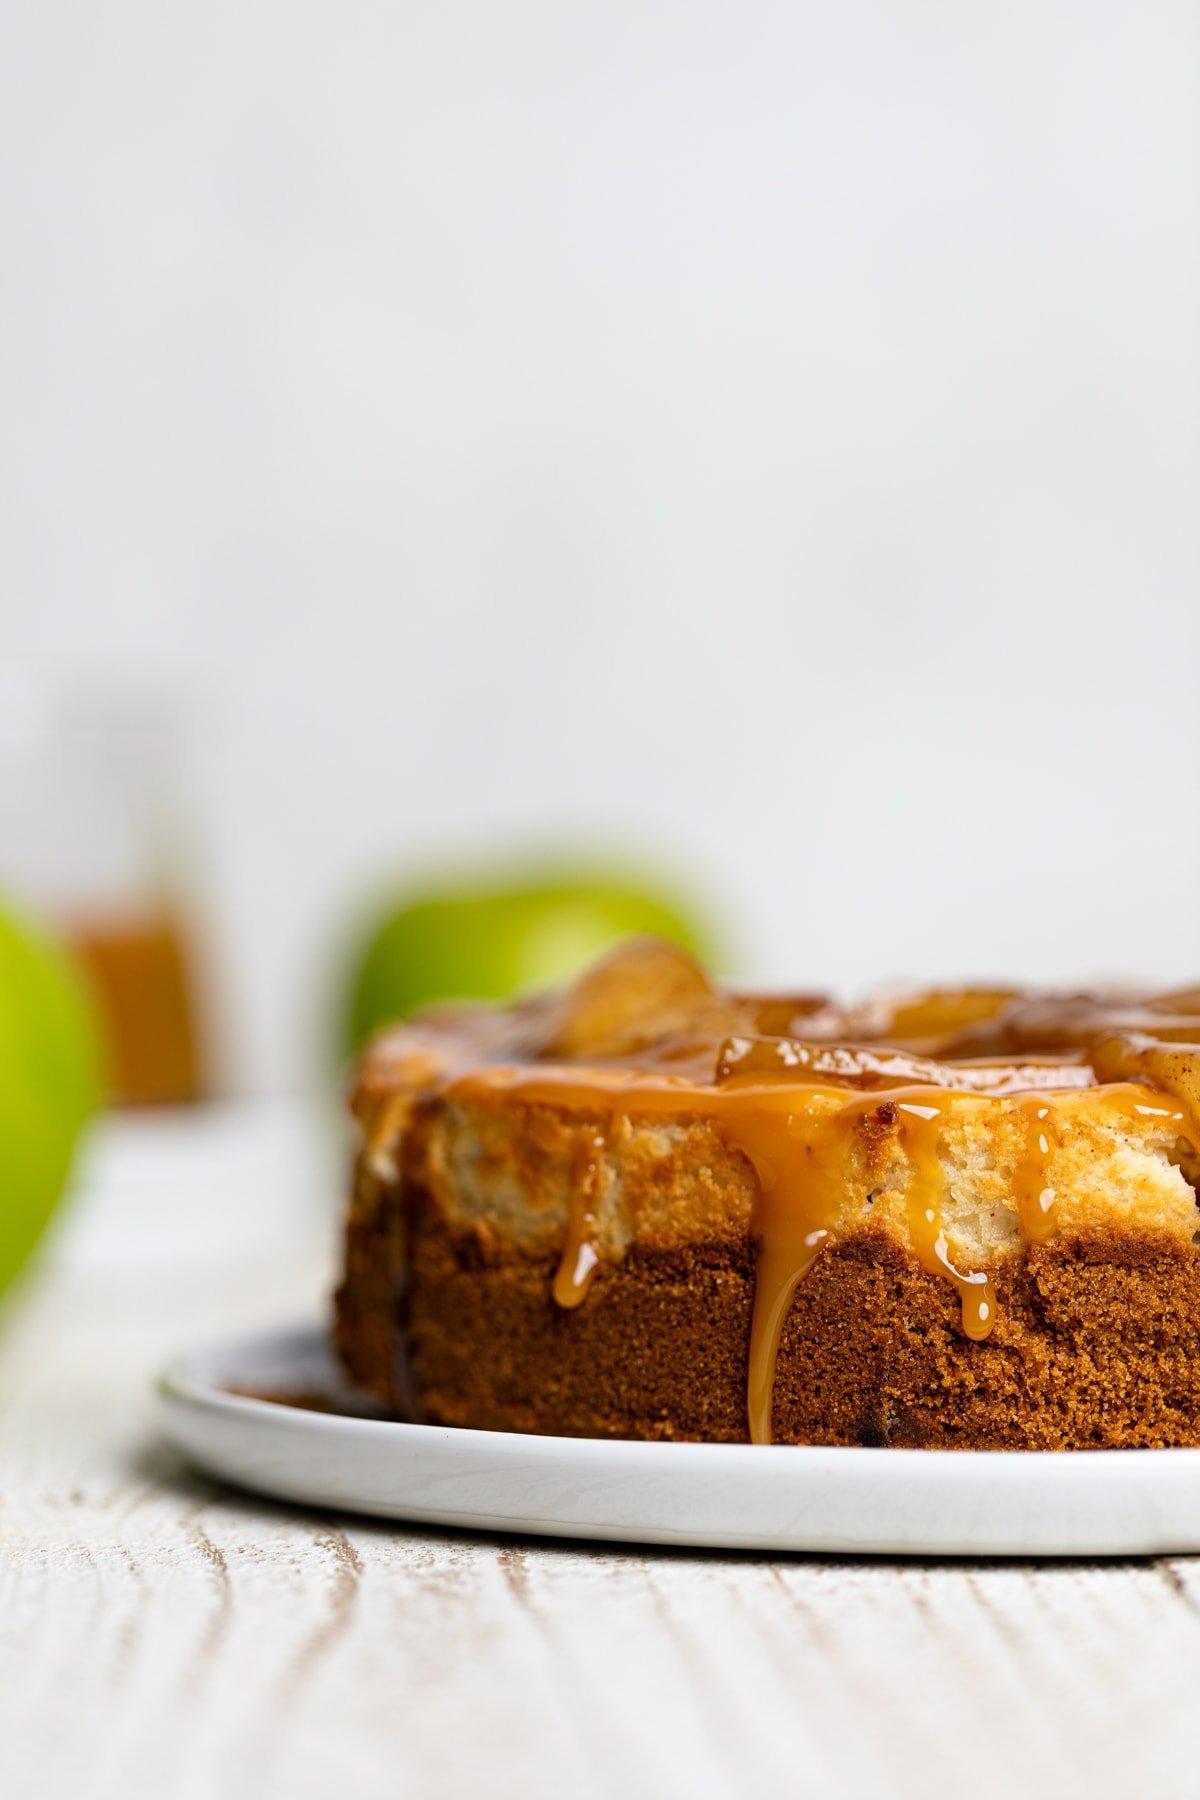 Best Caramel Apple Spice Cheesecake